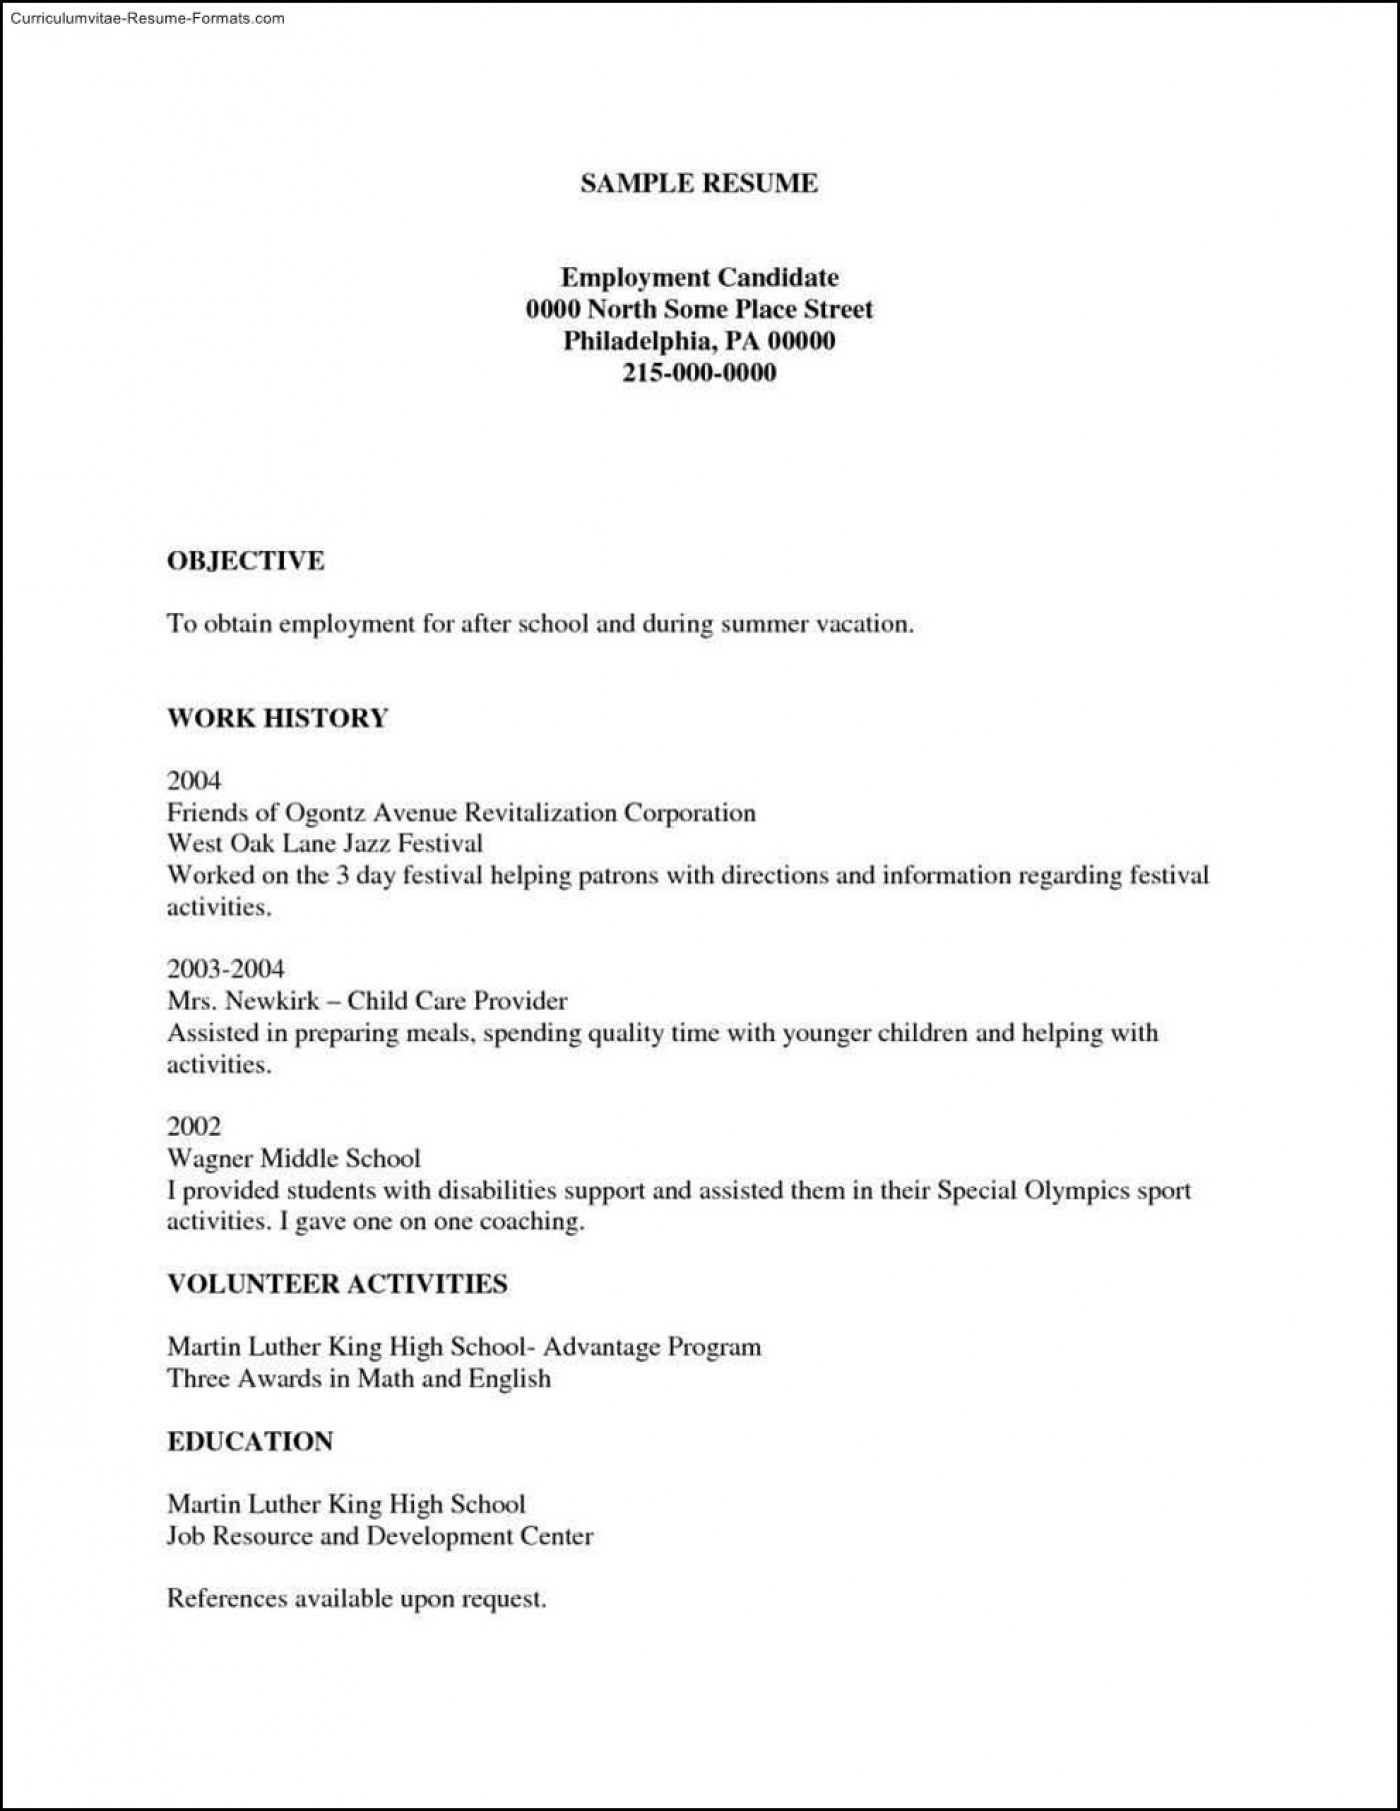 019 Templates Free Printable Basic Resume Template On Tips Ideas - Free Printable Resume Templates Microsoft Word